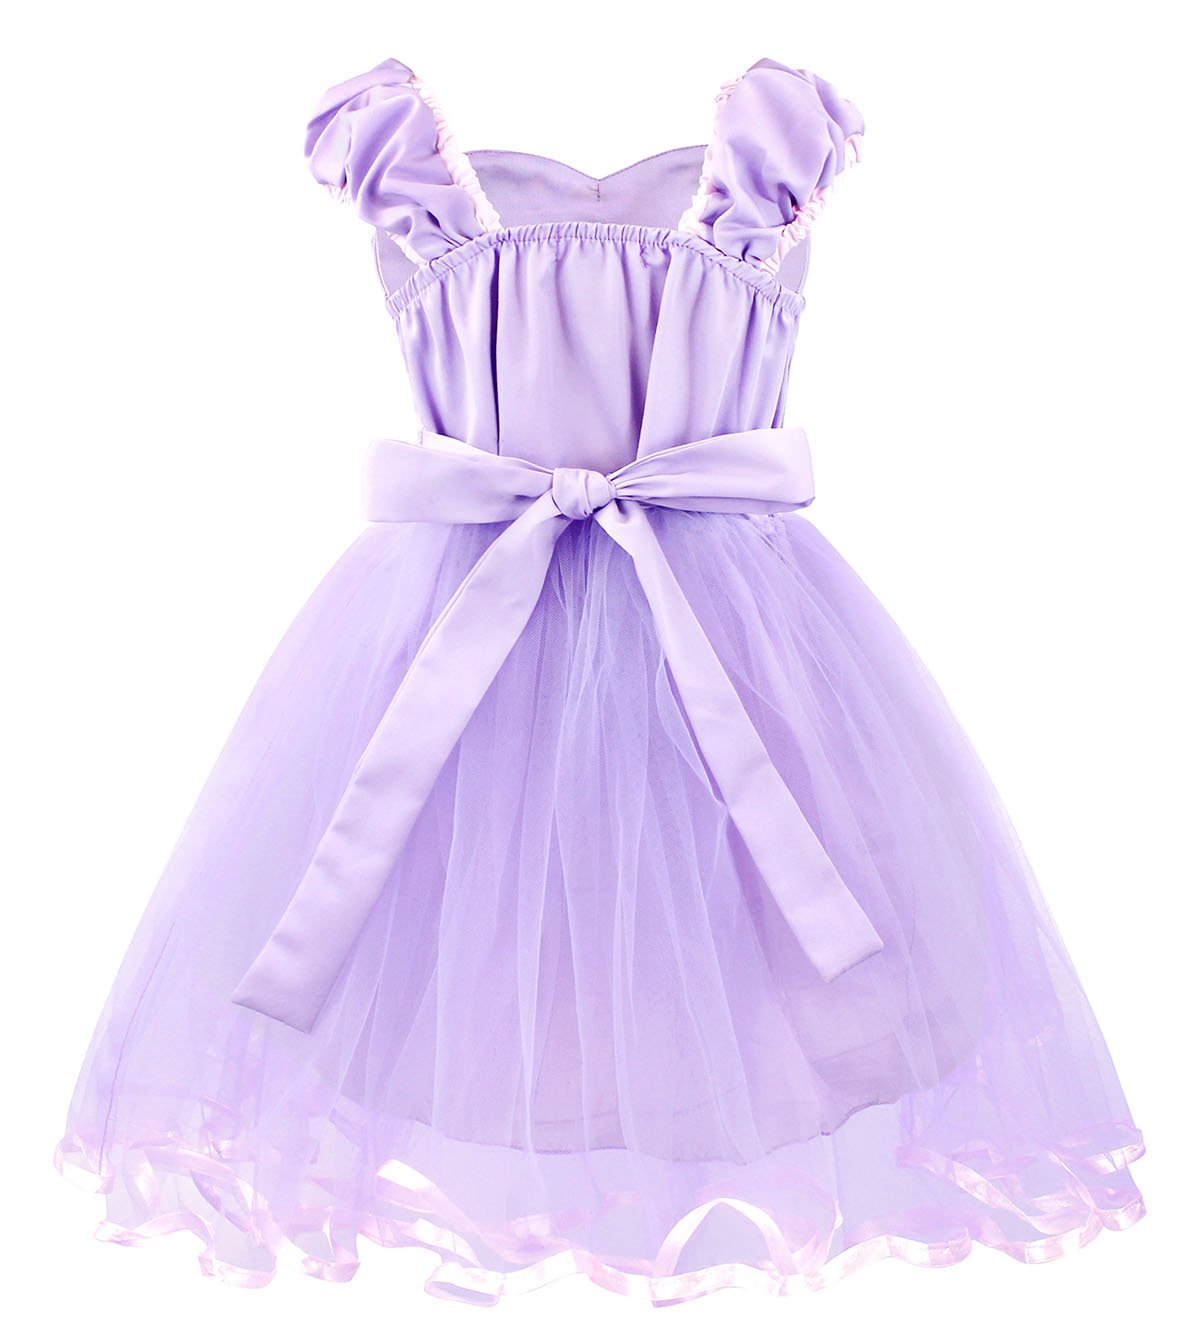 Cotrio Girls Princess Rapunzel Dress up Costume Halloween Cosplay Fancy Party Dresses Size 4T (110, Rapunzel Tutu Dress) by Cotrio (Image #2)